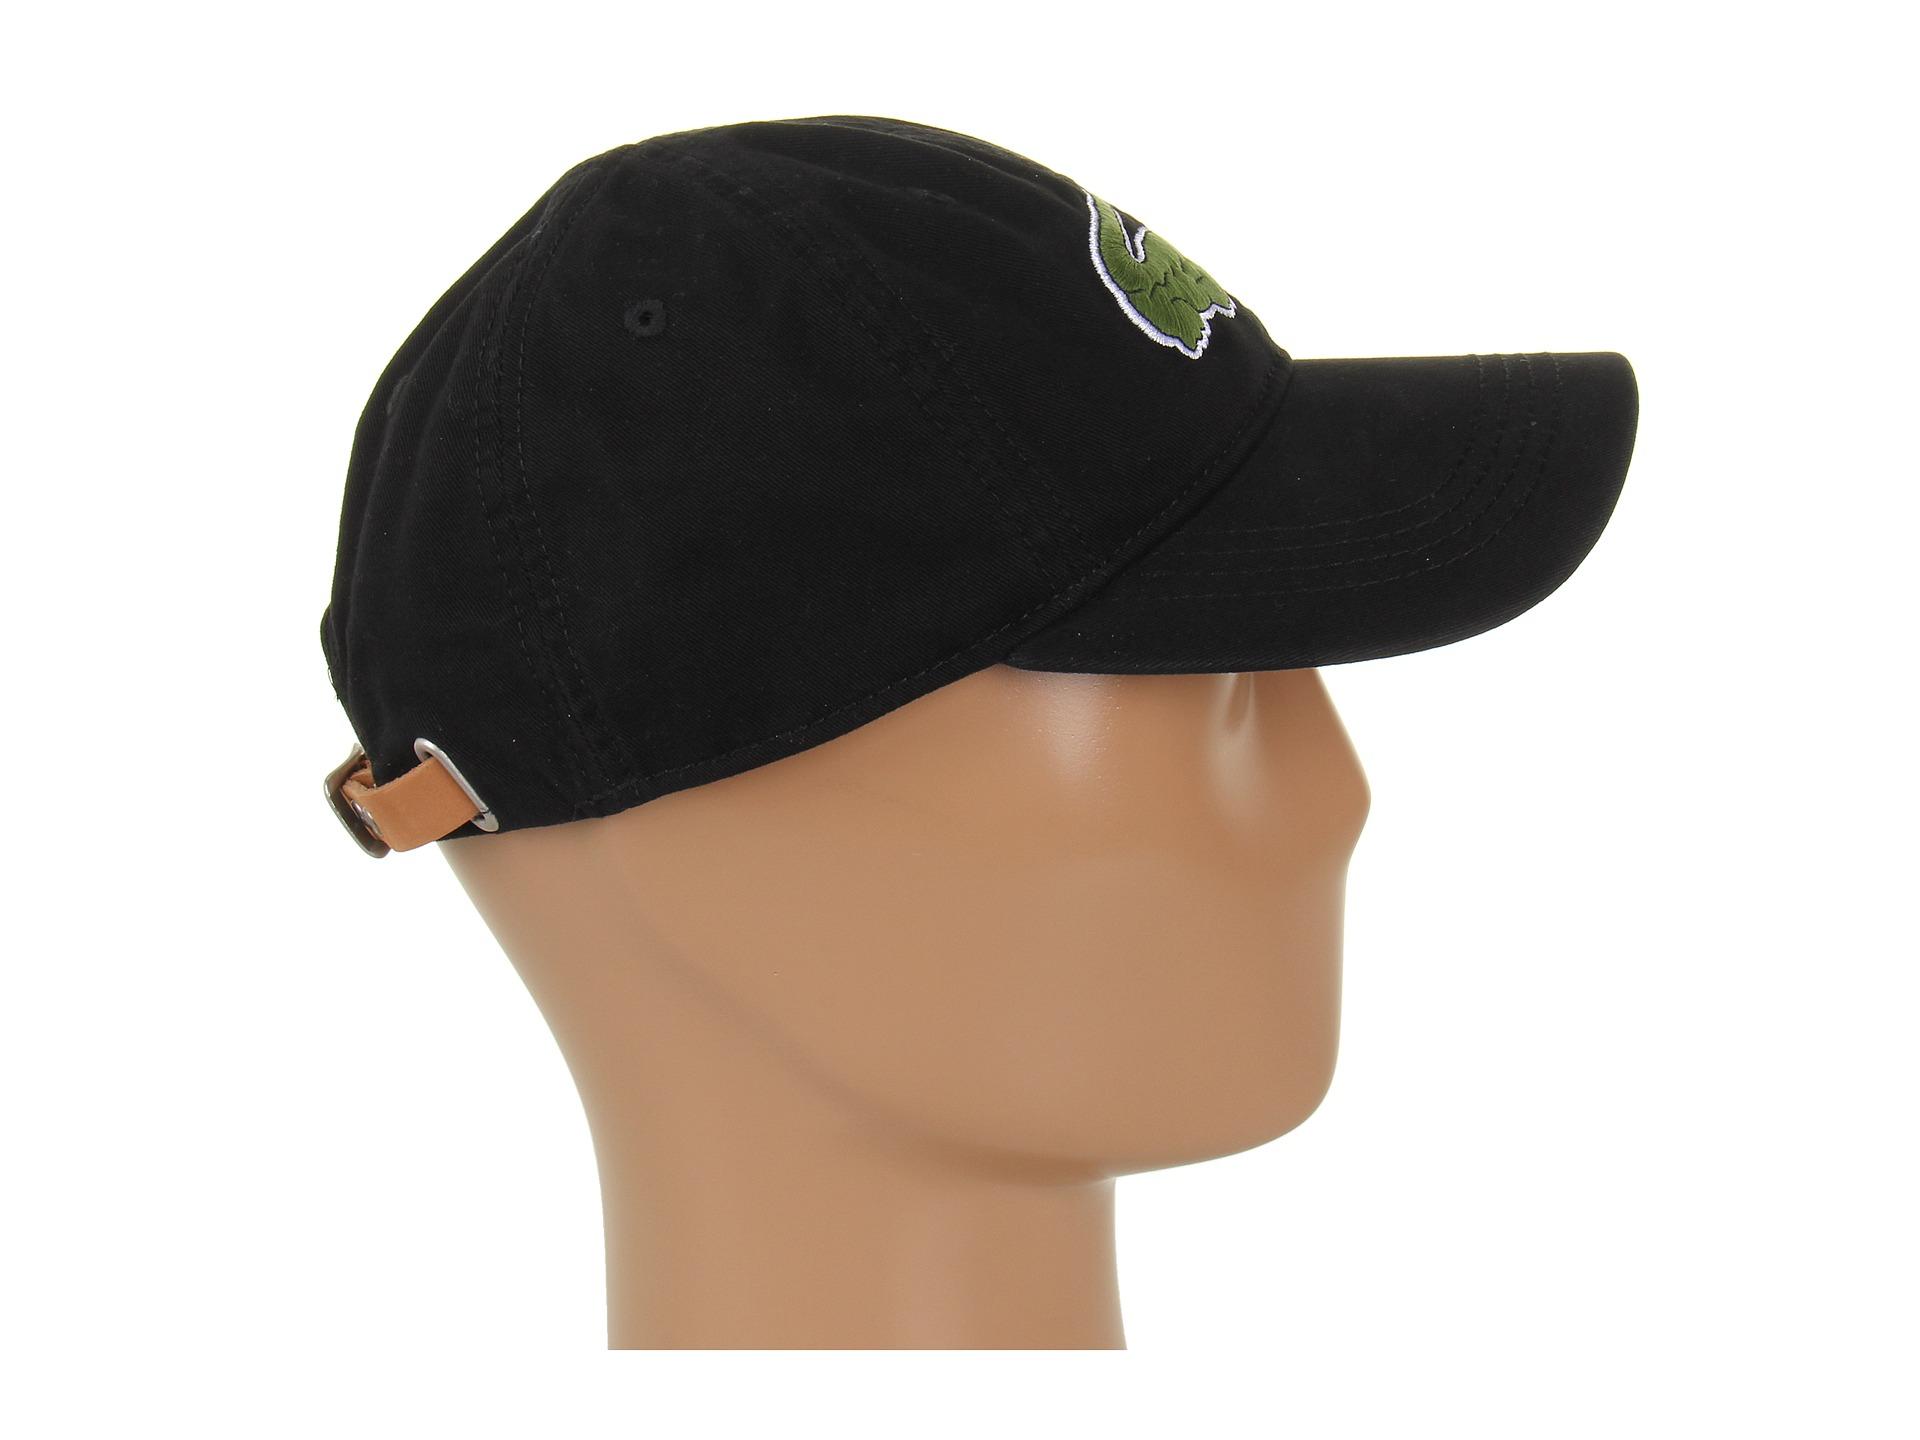 9564010024a9e Lyst - Lacoste Large Croc Gabardine Cap in Black for Men